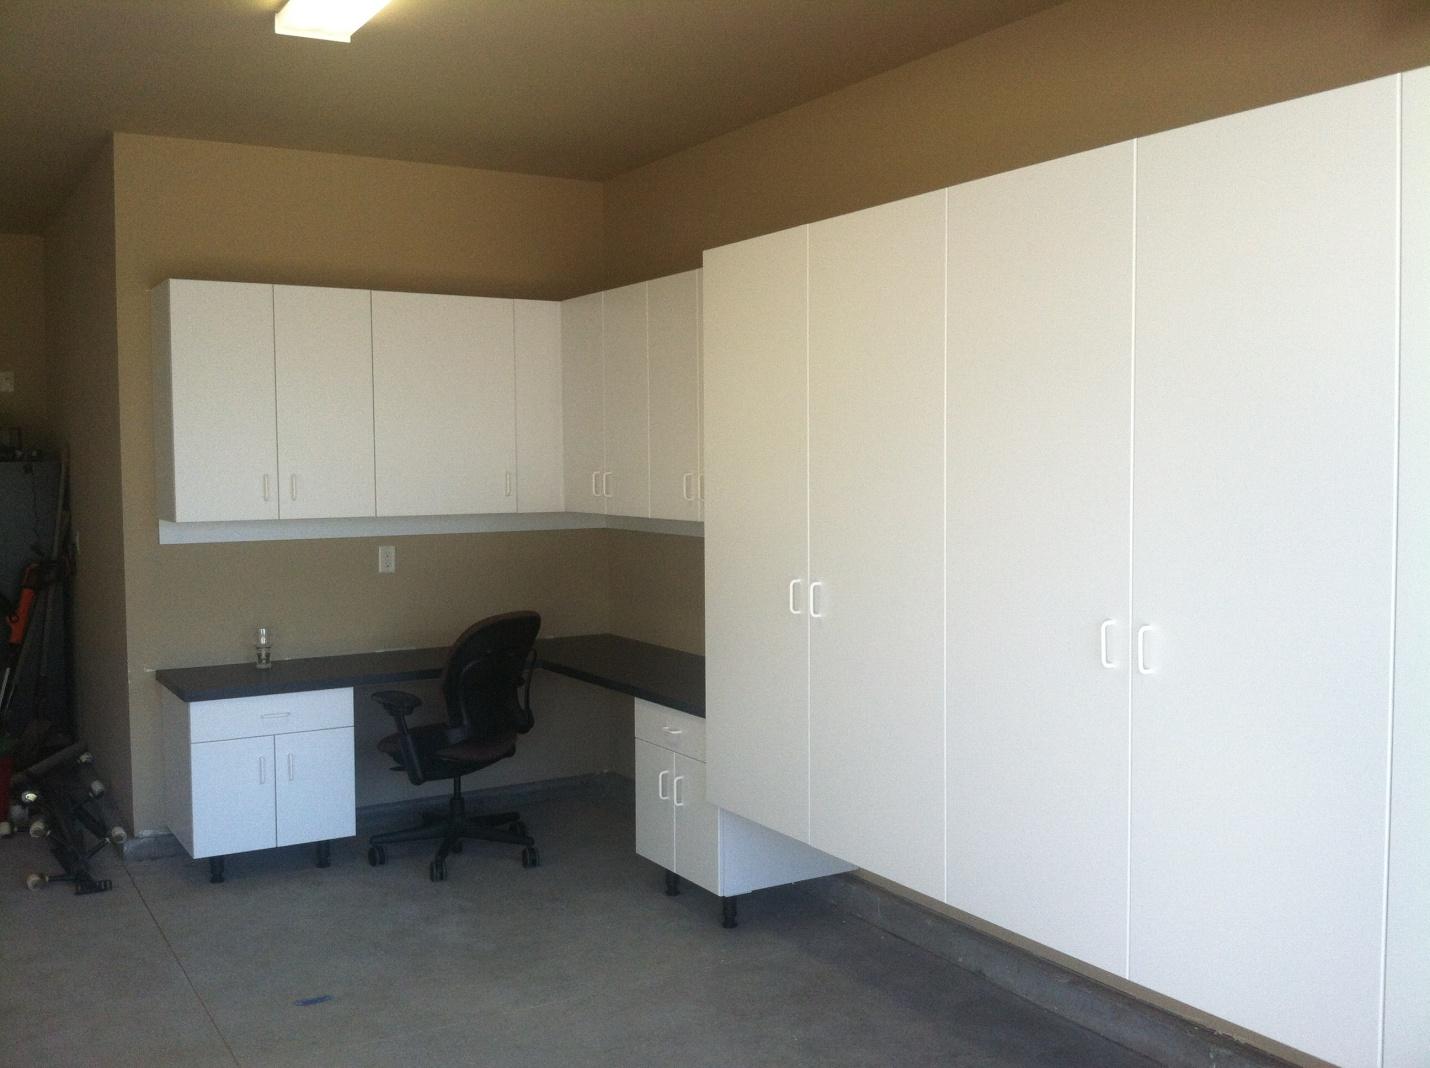 Car + desk + cabinets